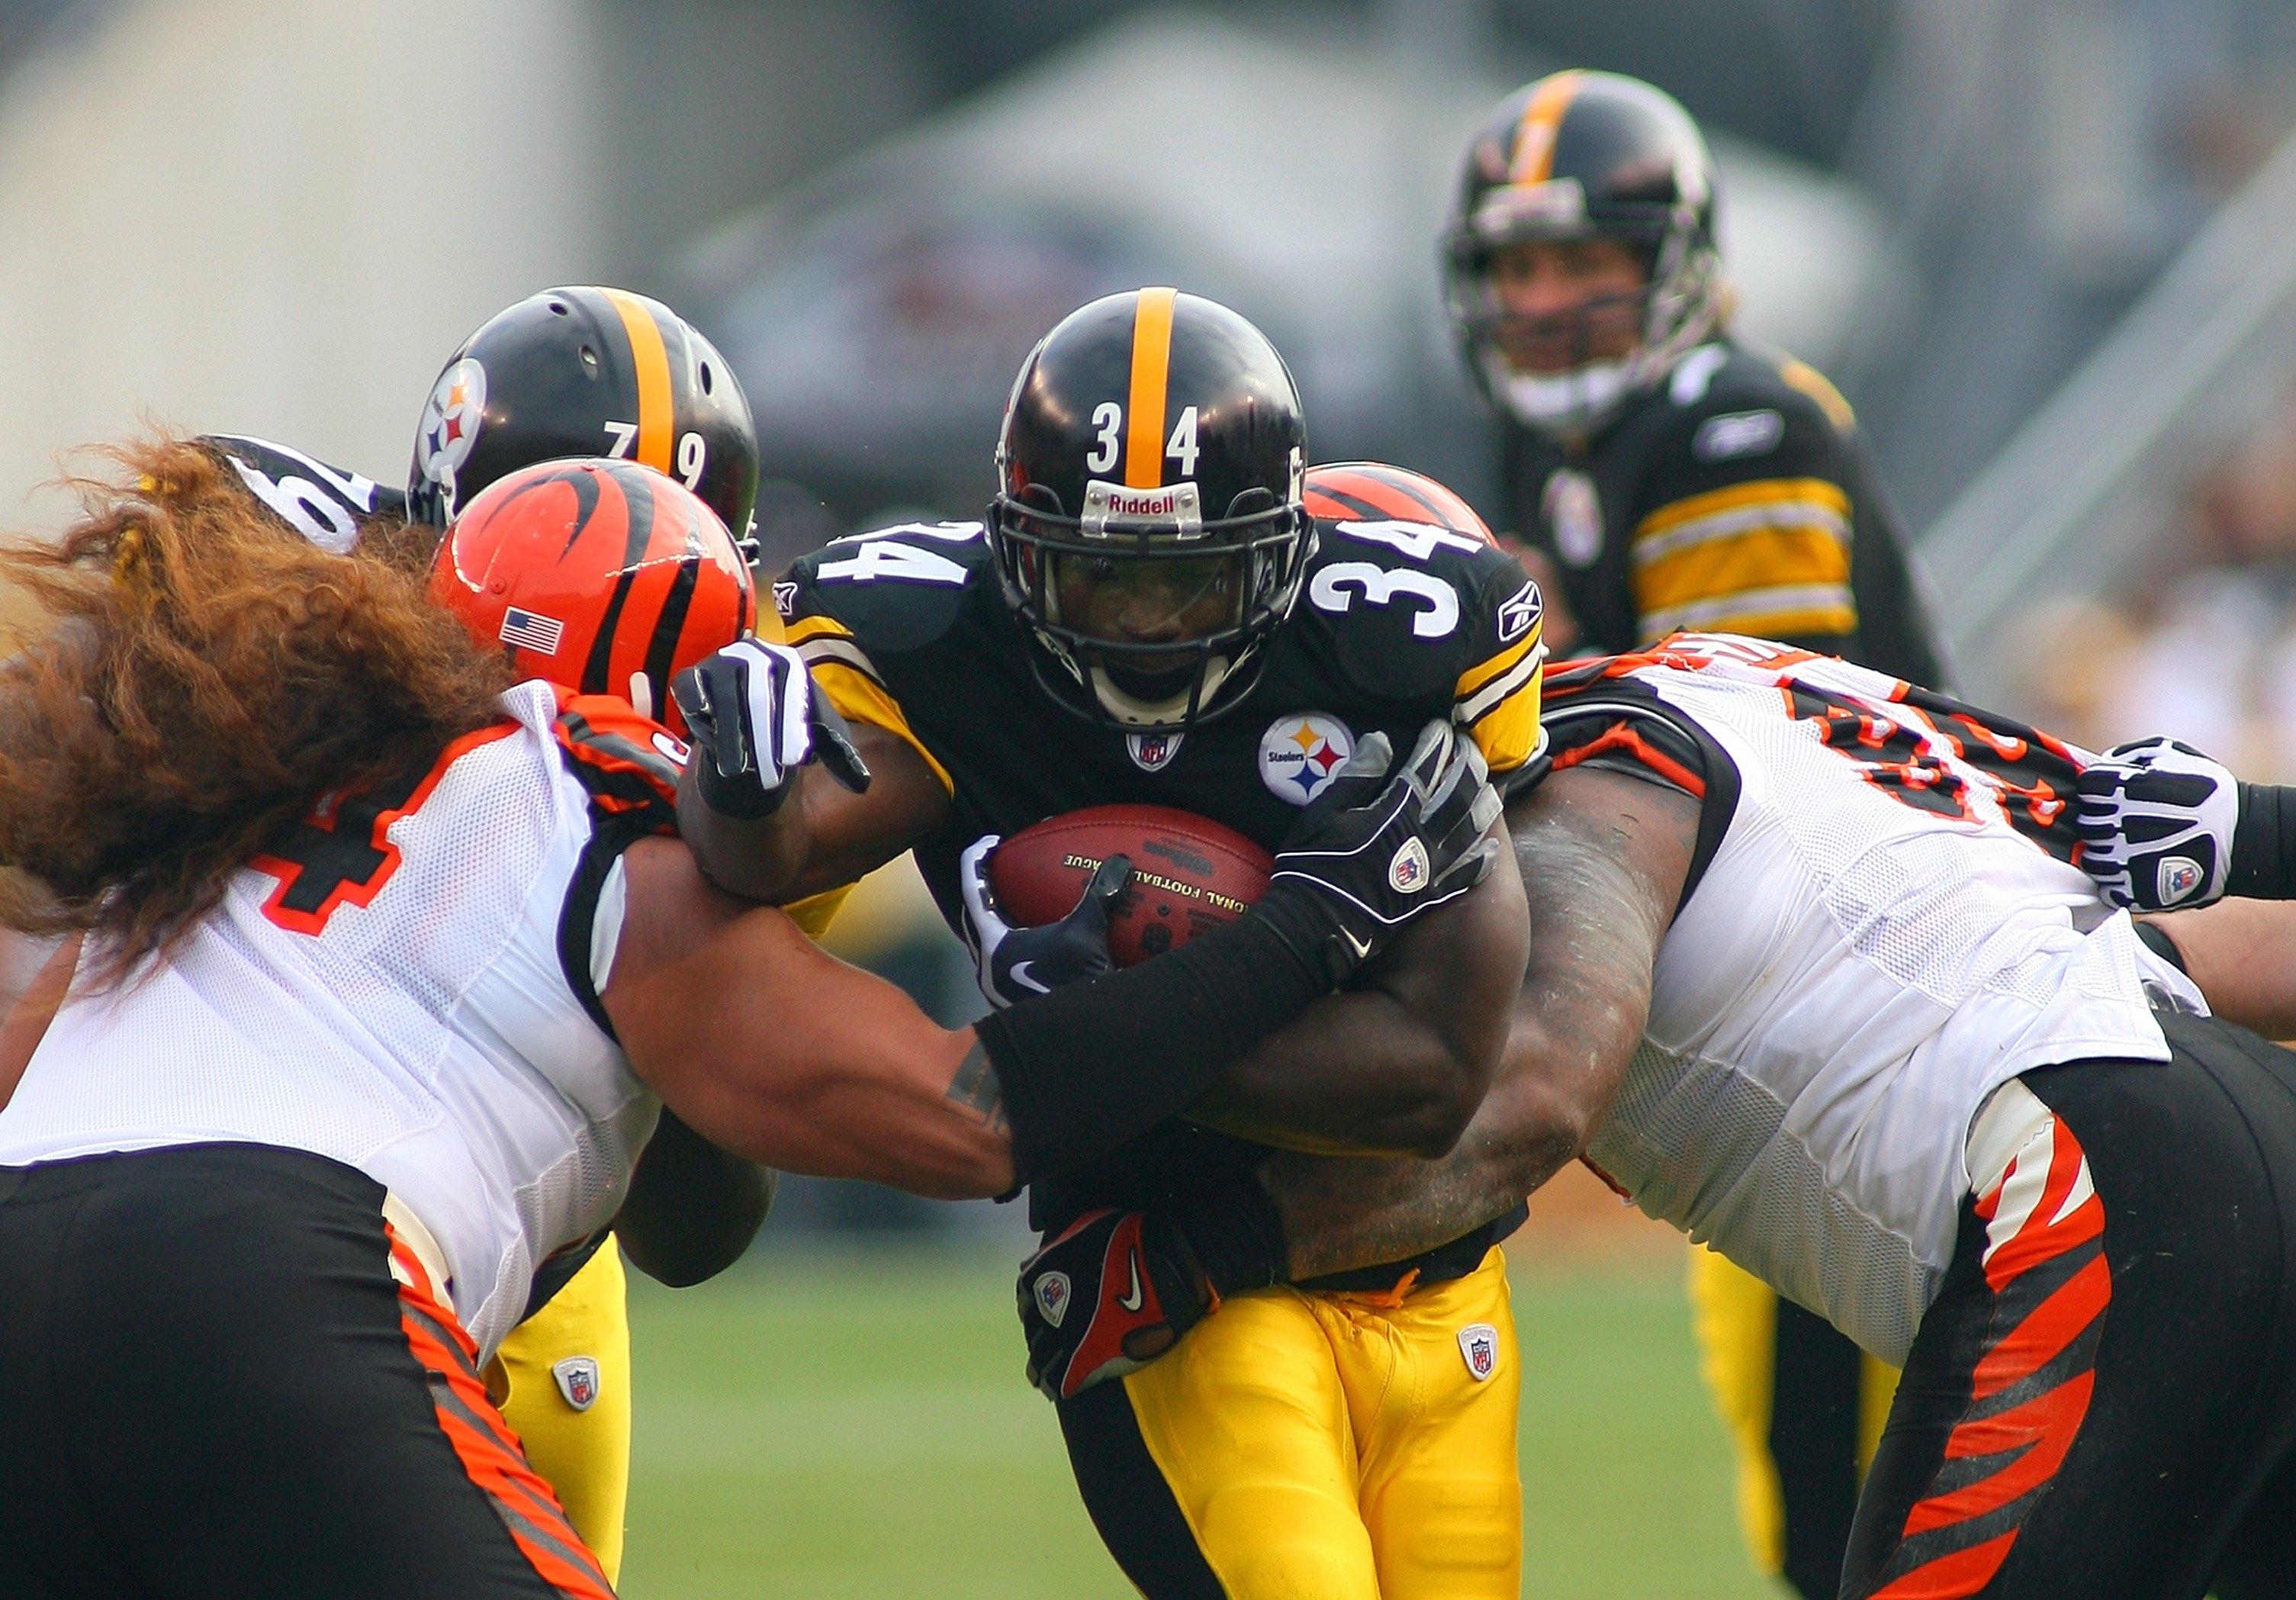 4768c5df6 PITTSBURGH - NOVEMBER 15  Rashard Mendenhall  34 of the Pittsburgh Steelers  runs with the